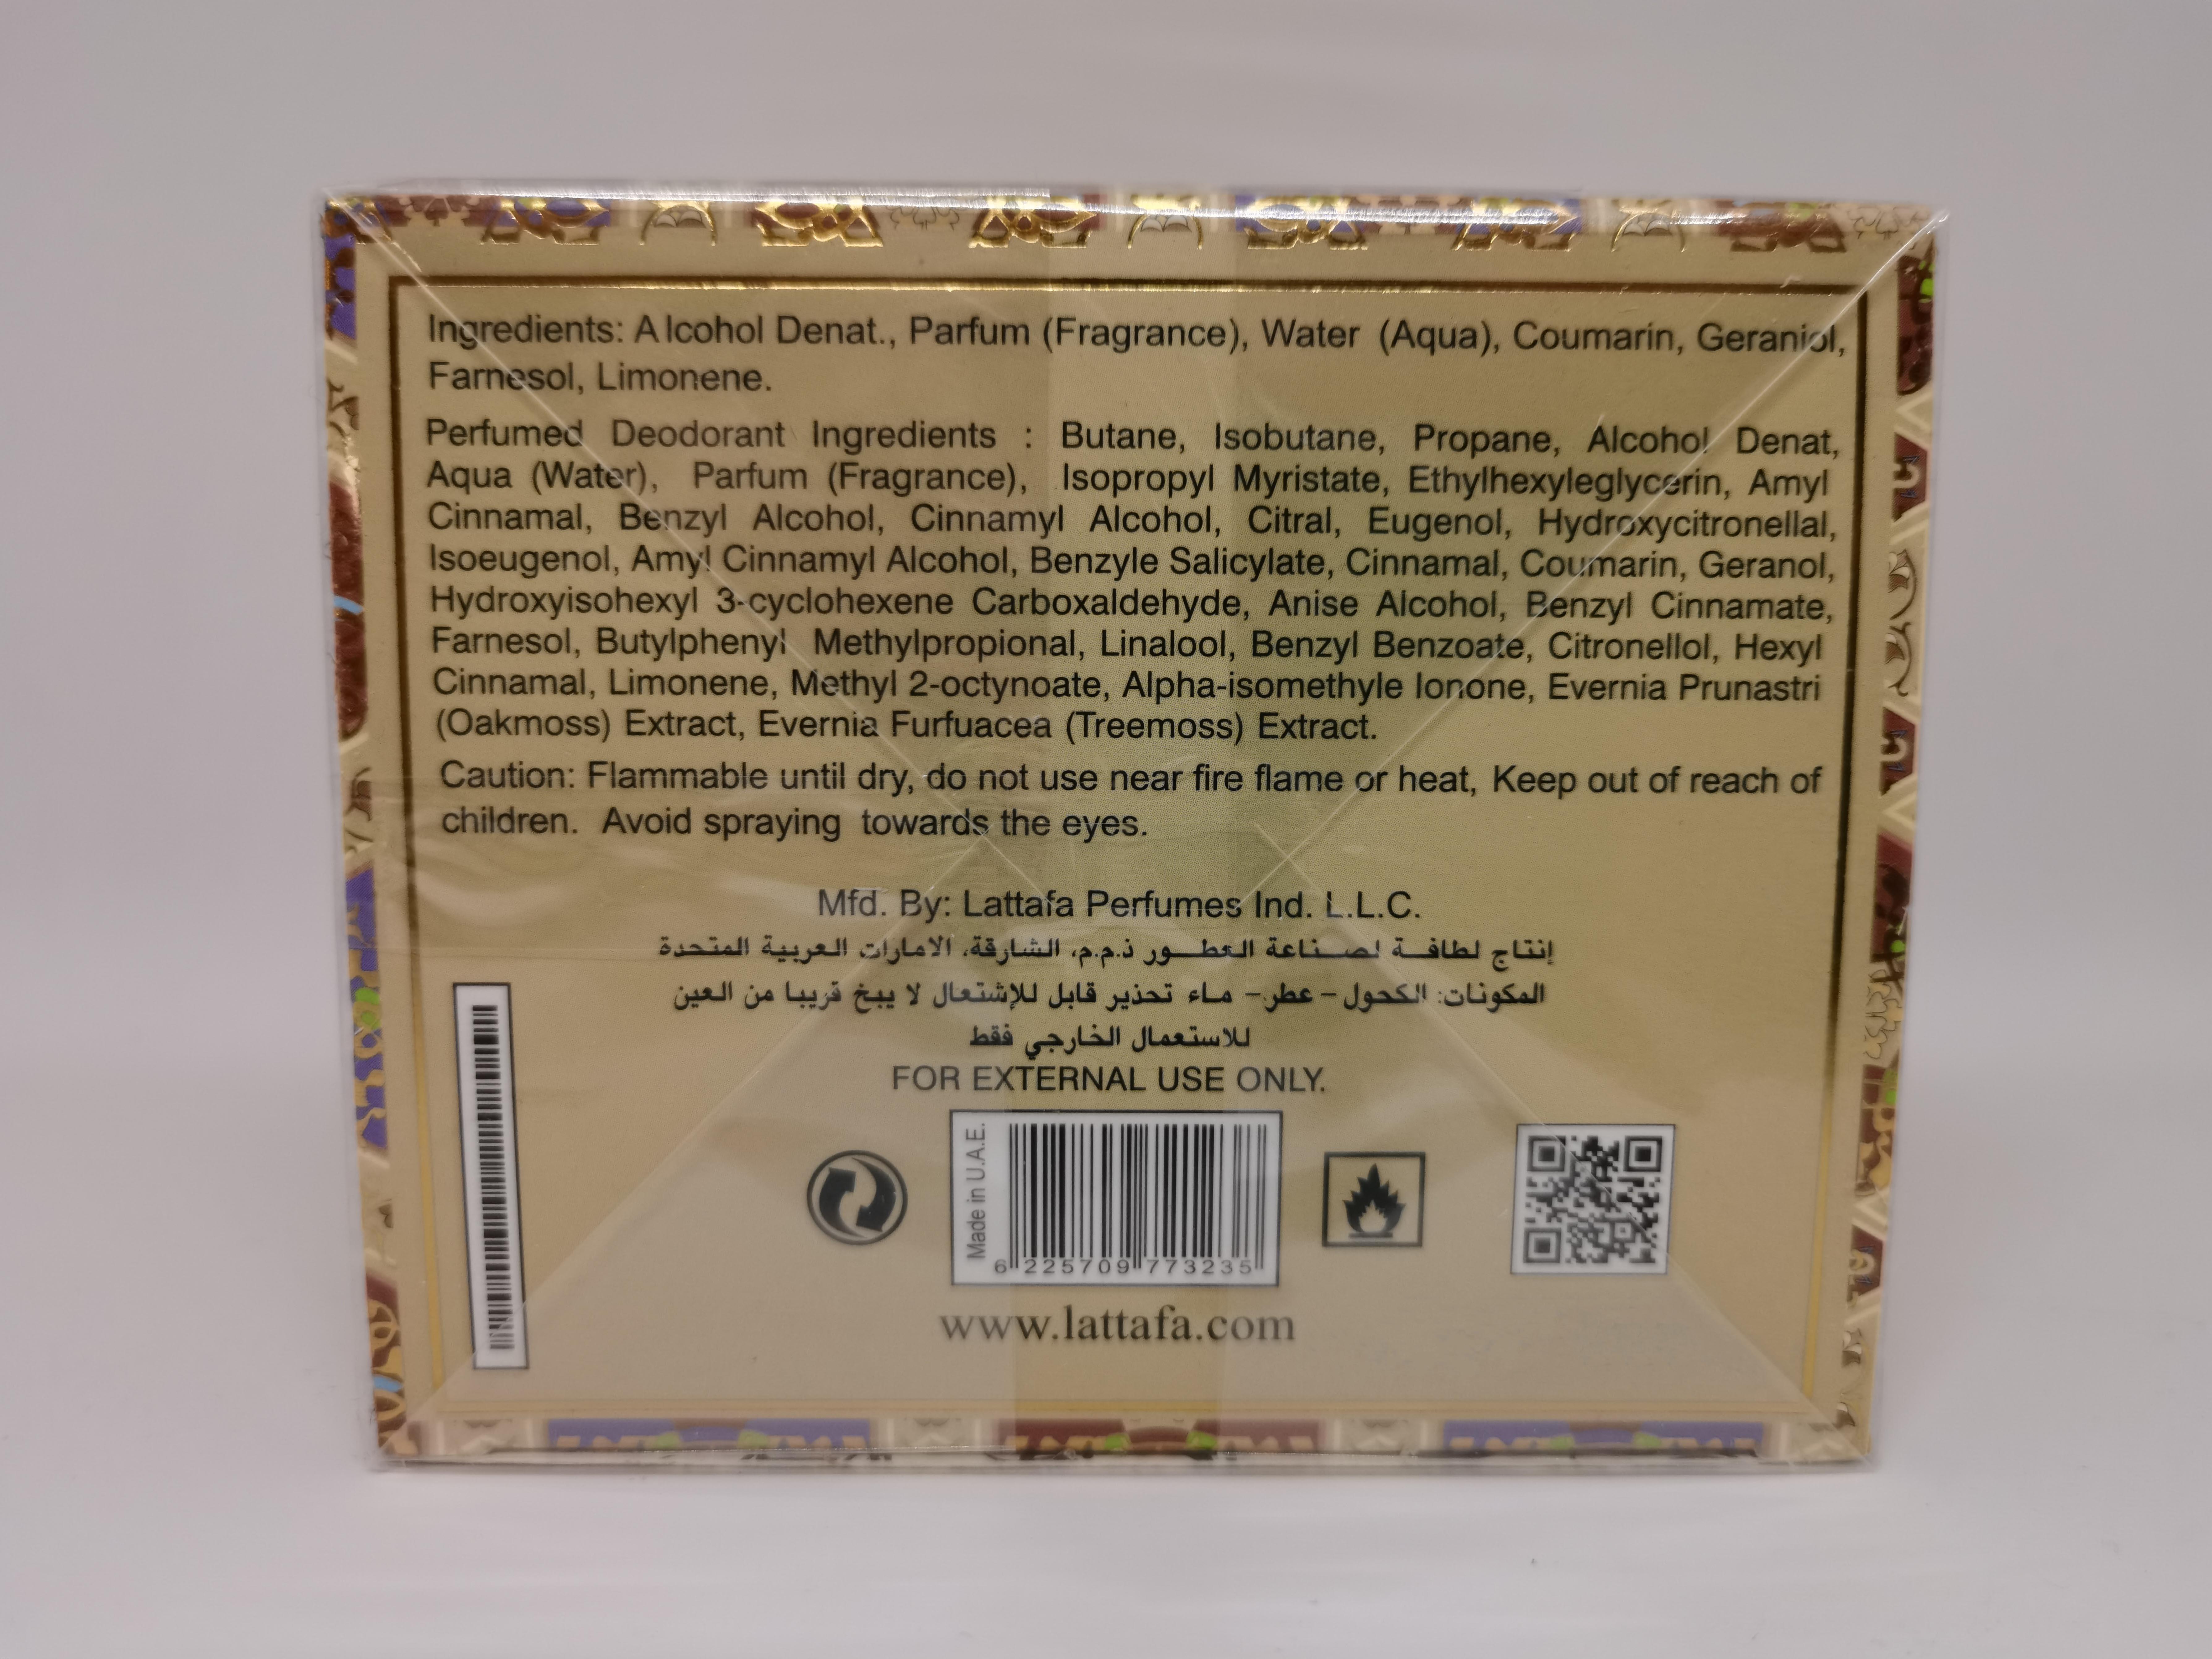 Парфюмерная вода 100 мл Lattafa Perfumes Raghba - фото штрих-кода на коробке